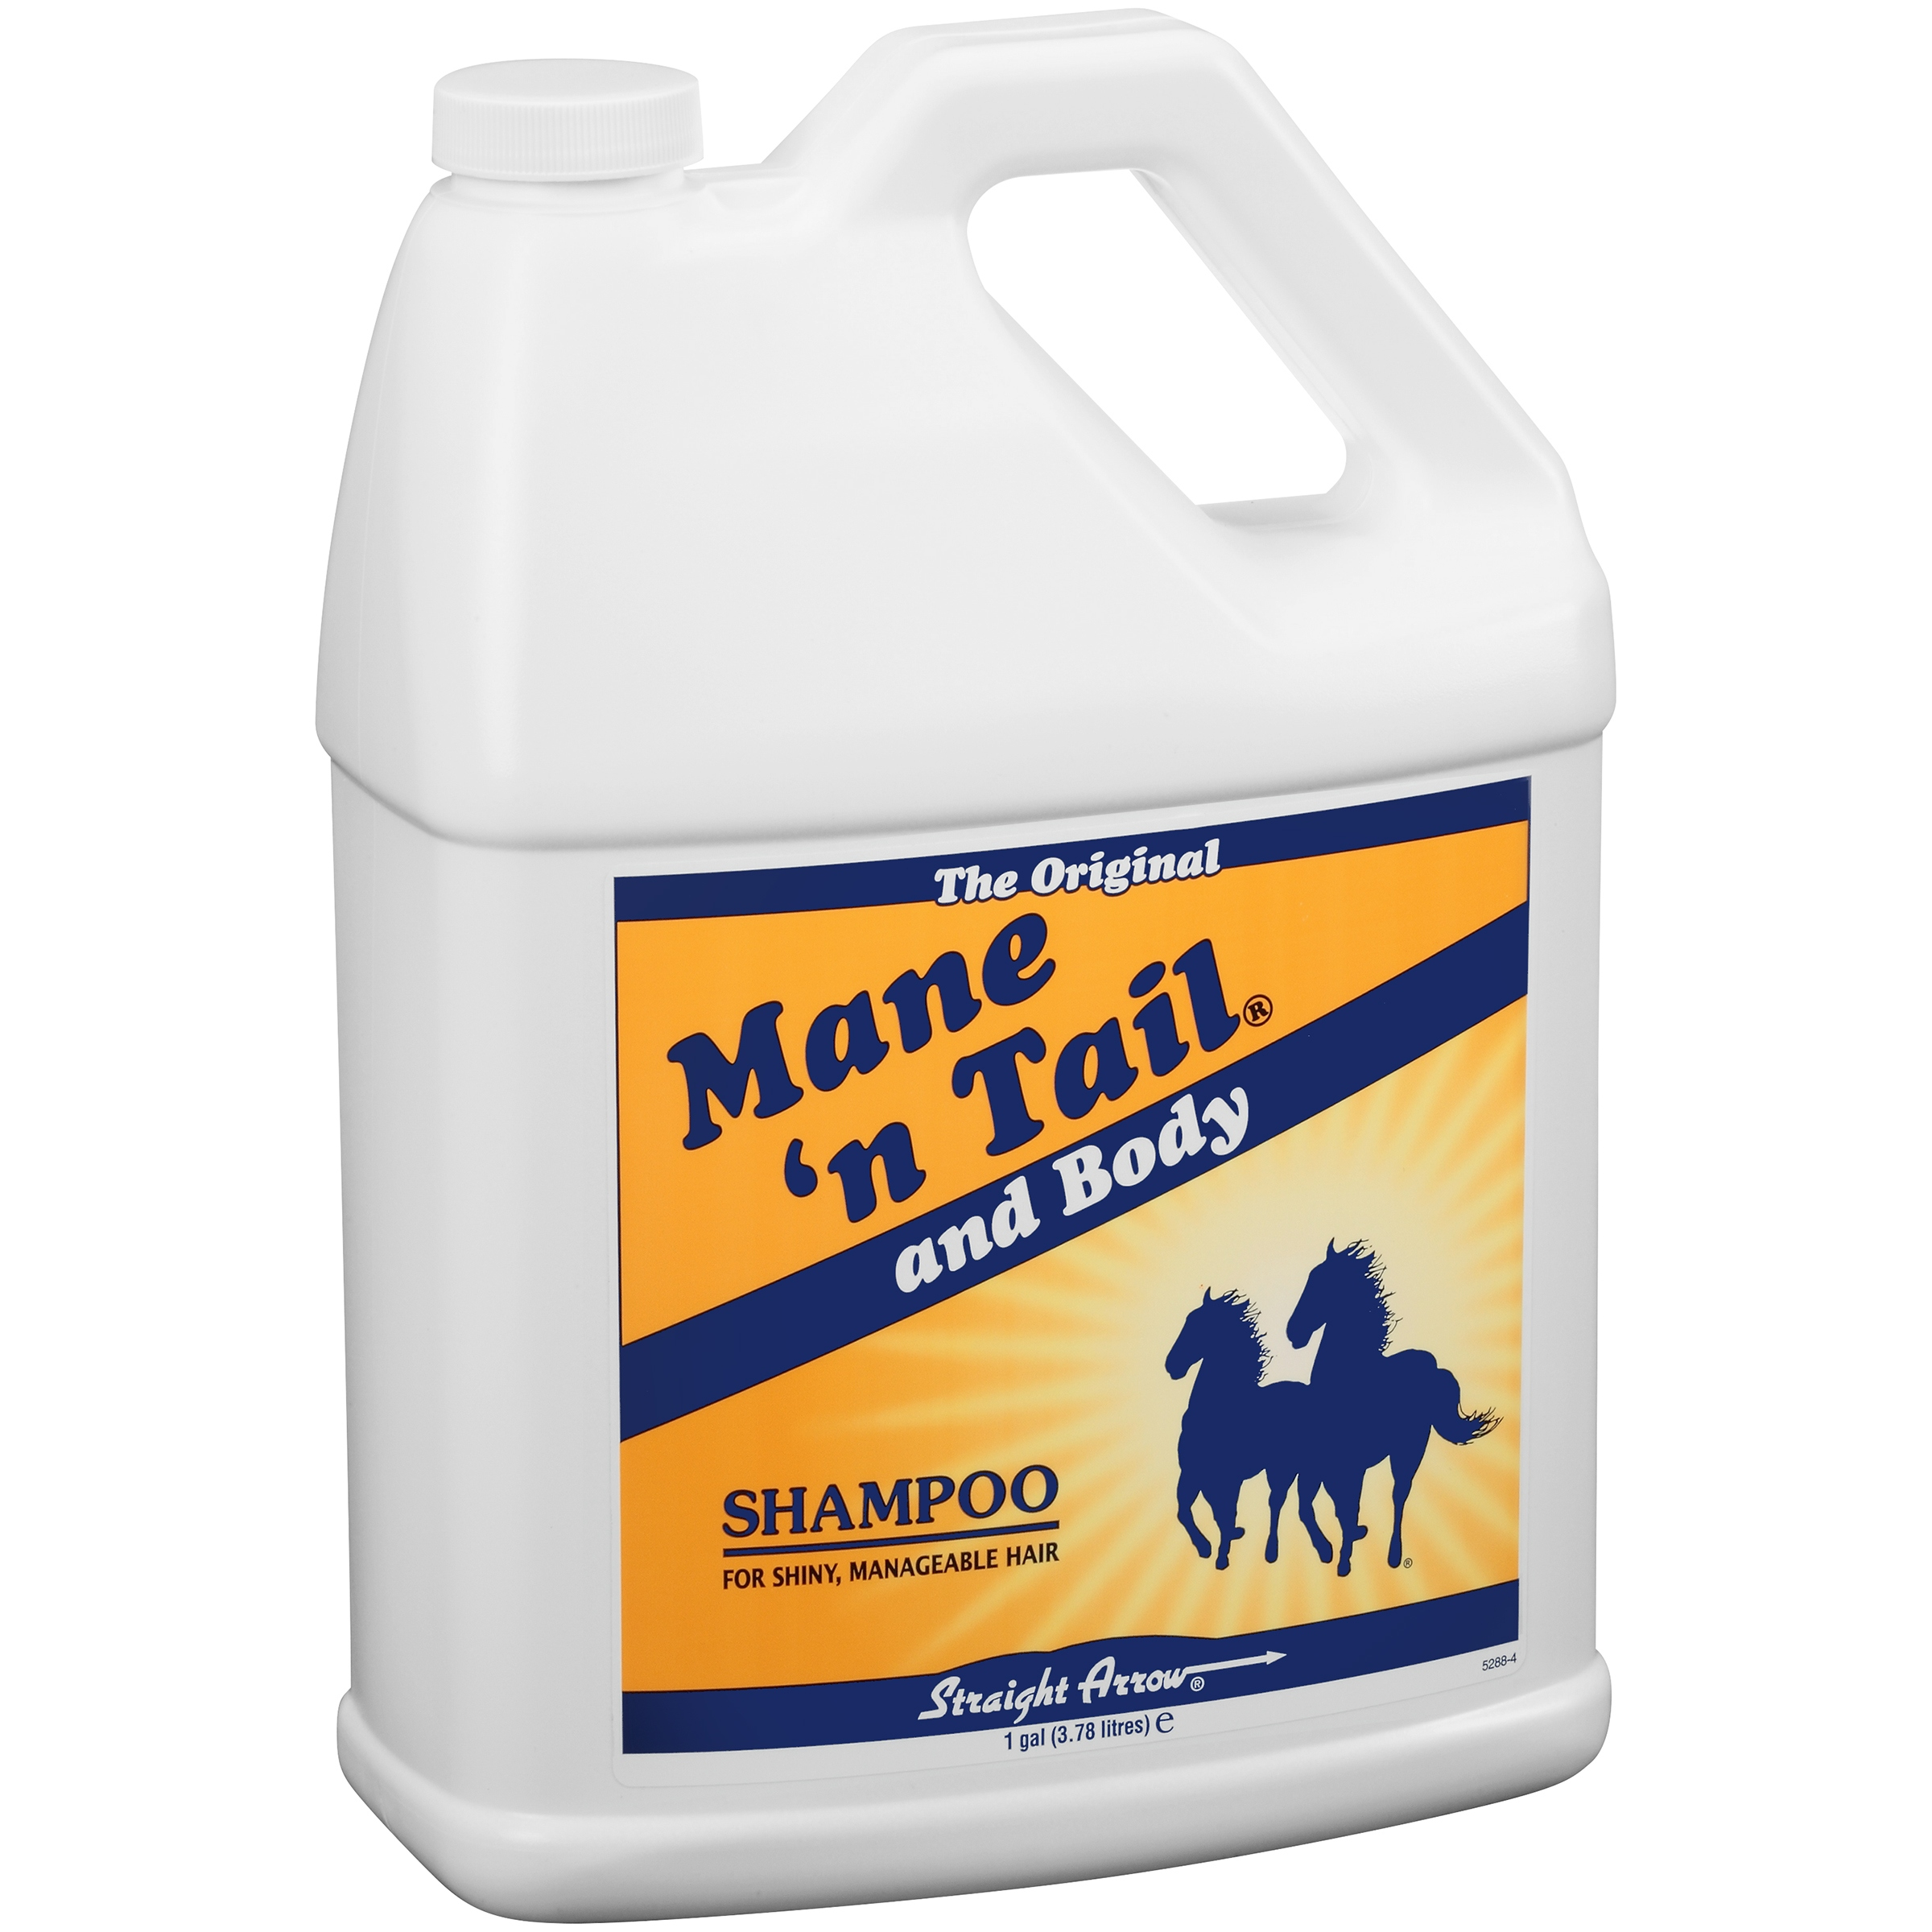 Mane 'n Tail® Shampoo and Body 1 gal. Jug